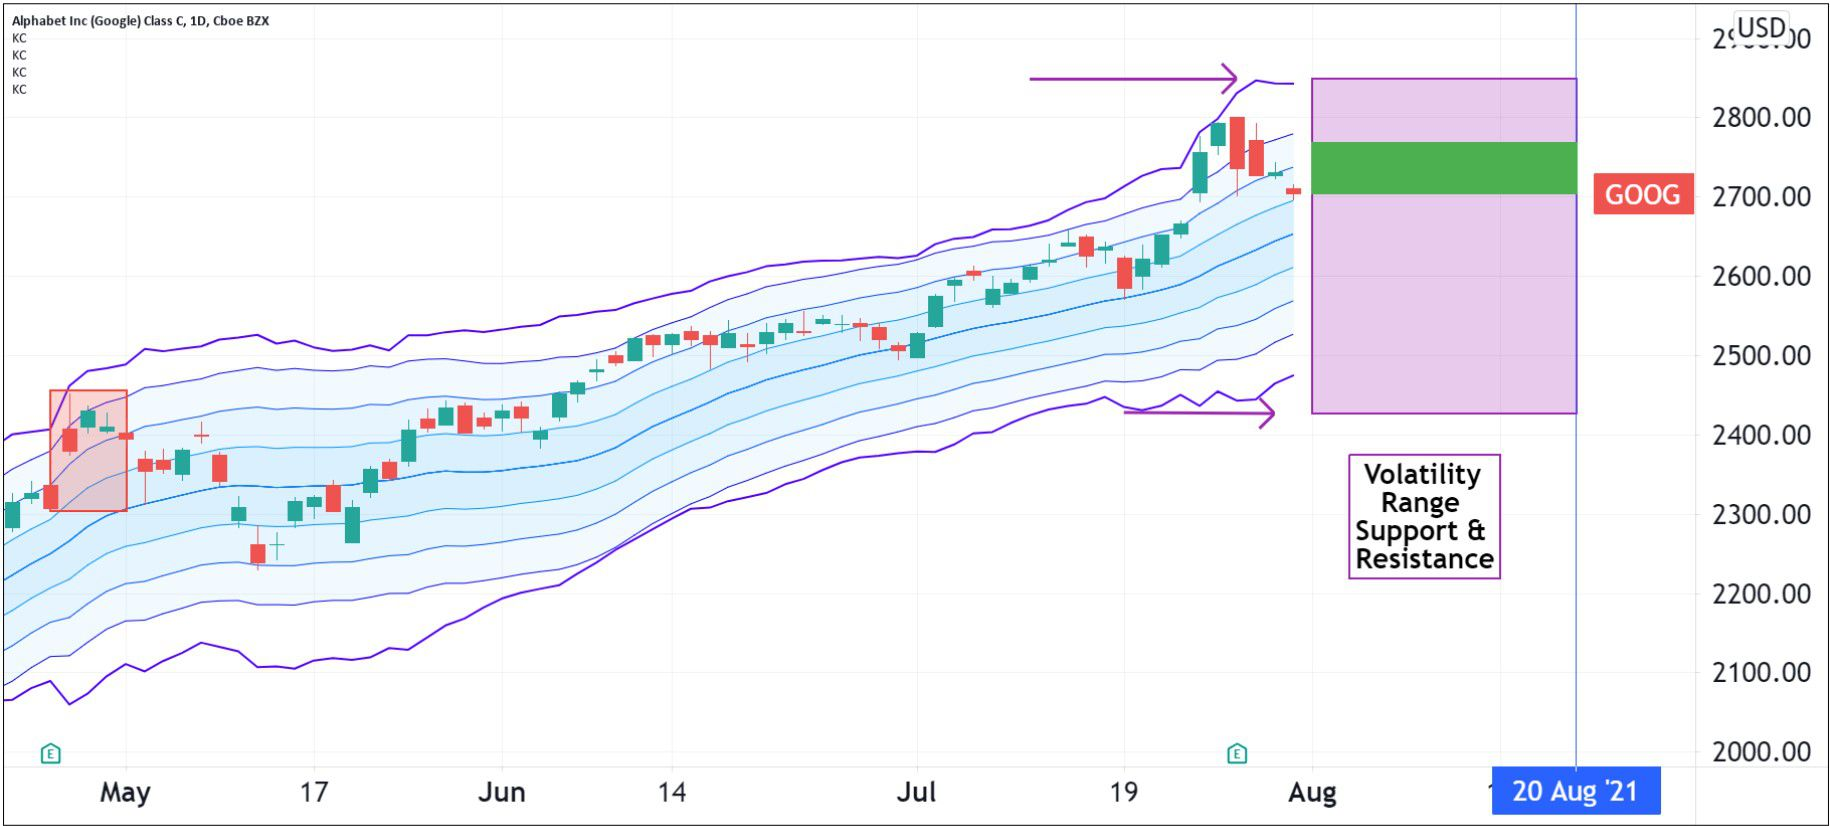 Volatility pattern for Alphabet Inc. (GOOG)